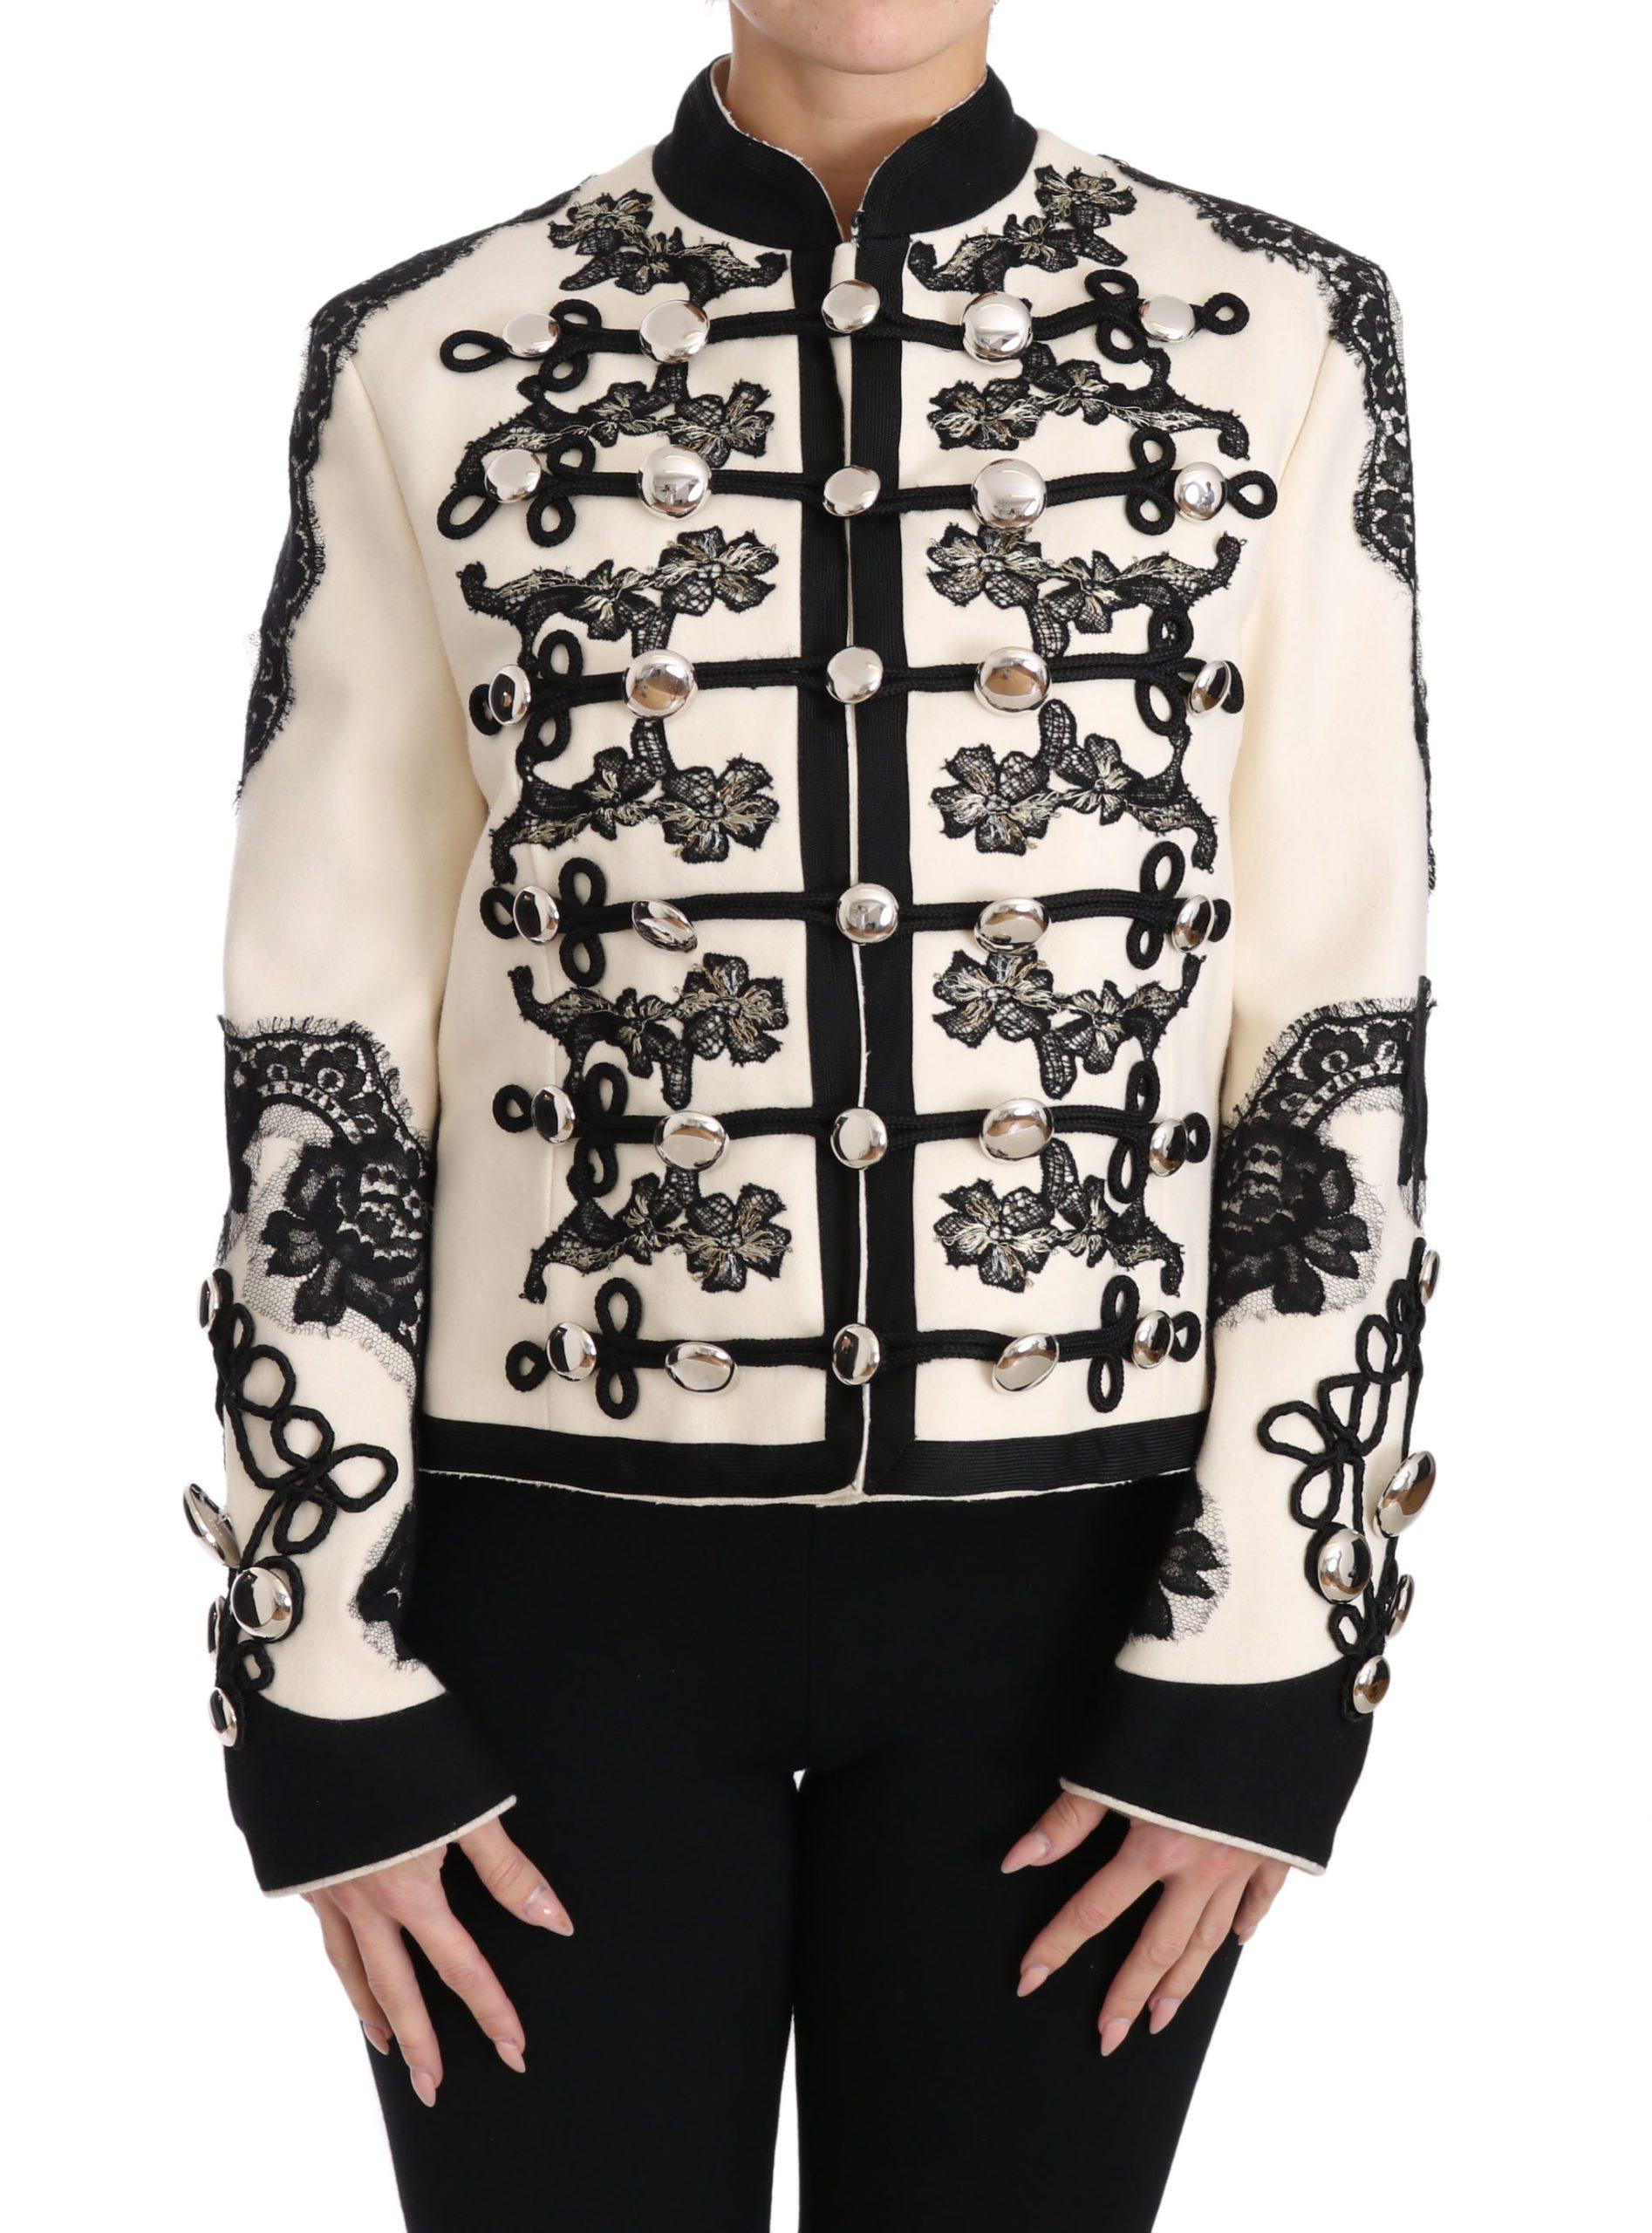 Dolce & Gabbana Women's Wool Floral Baroque Jacket White JKT2317 - IT36 | XS